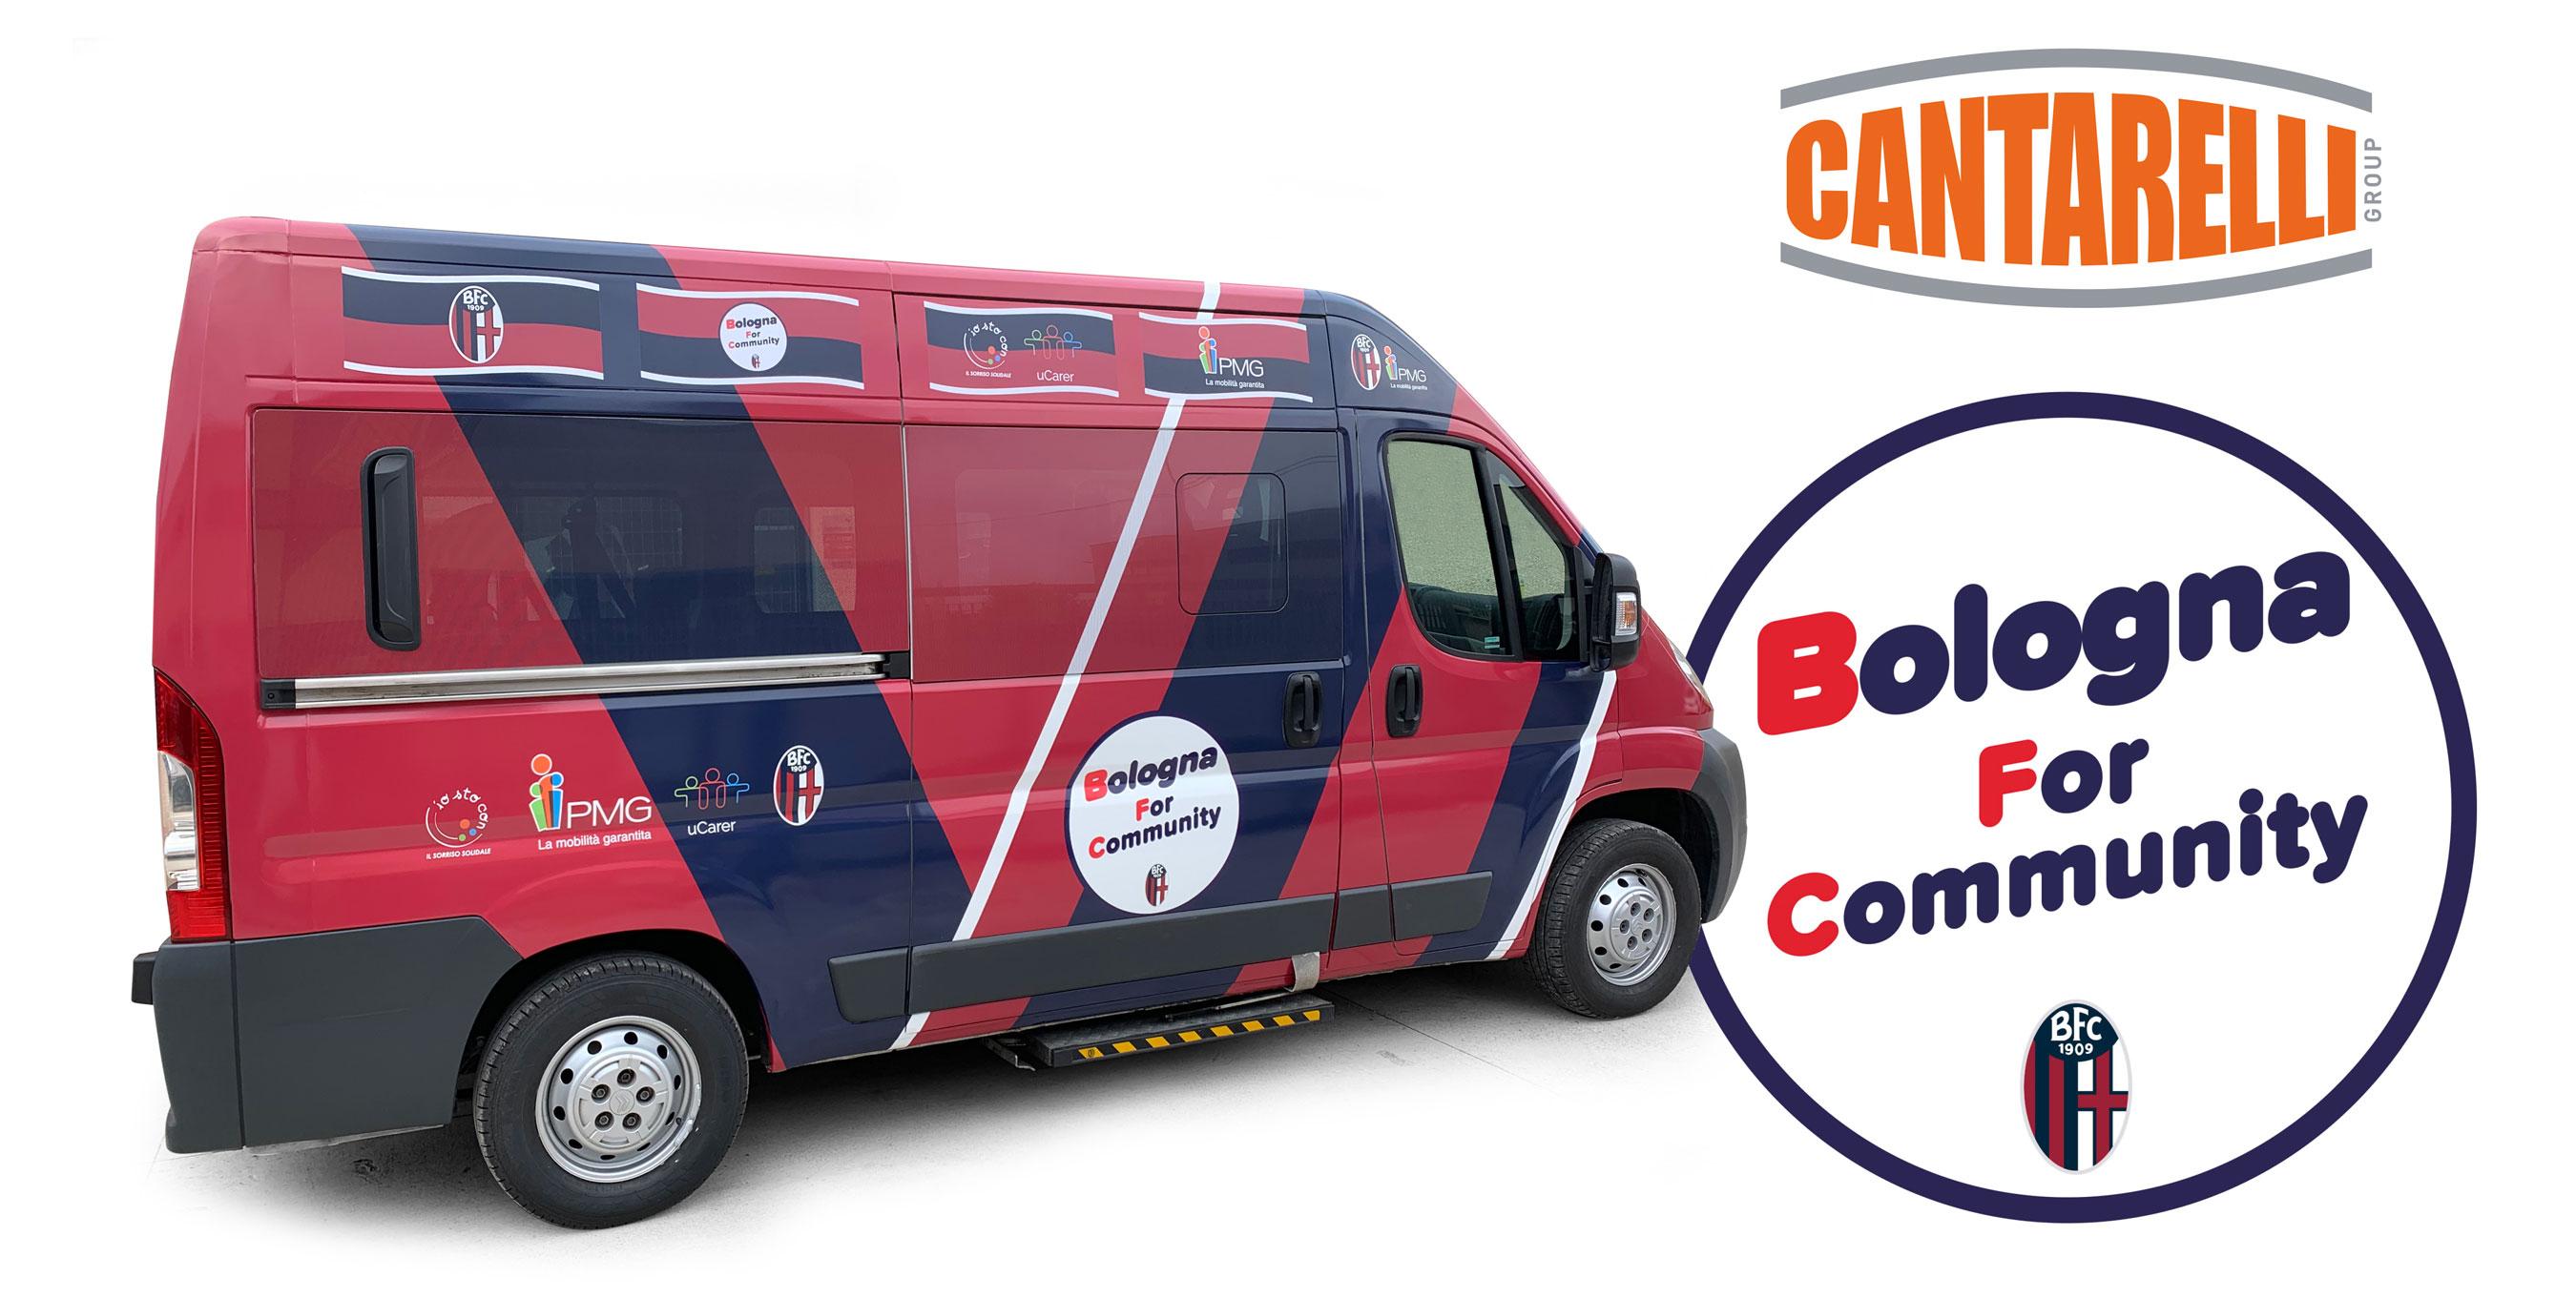 Cantarelli Group Bologna Calcio for Comunity